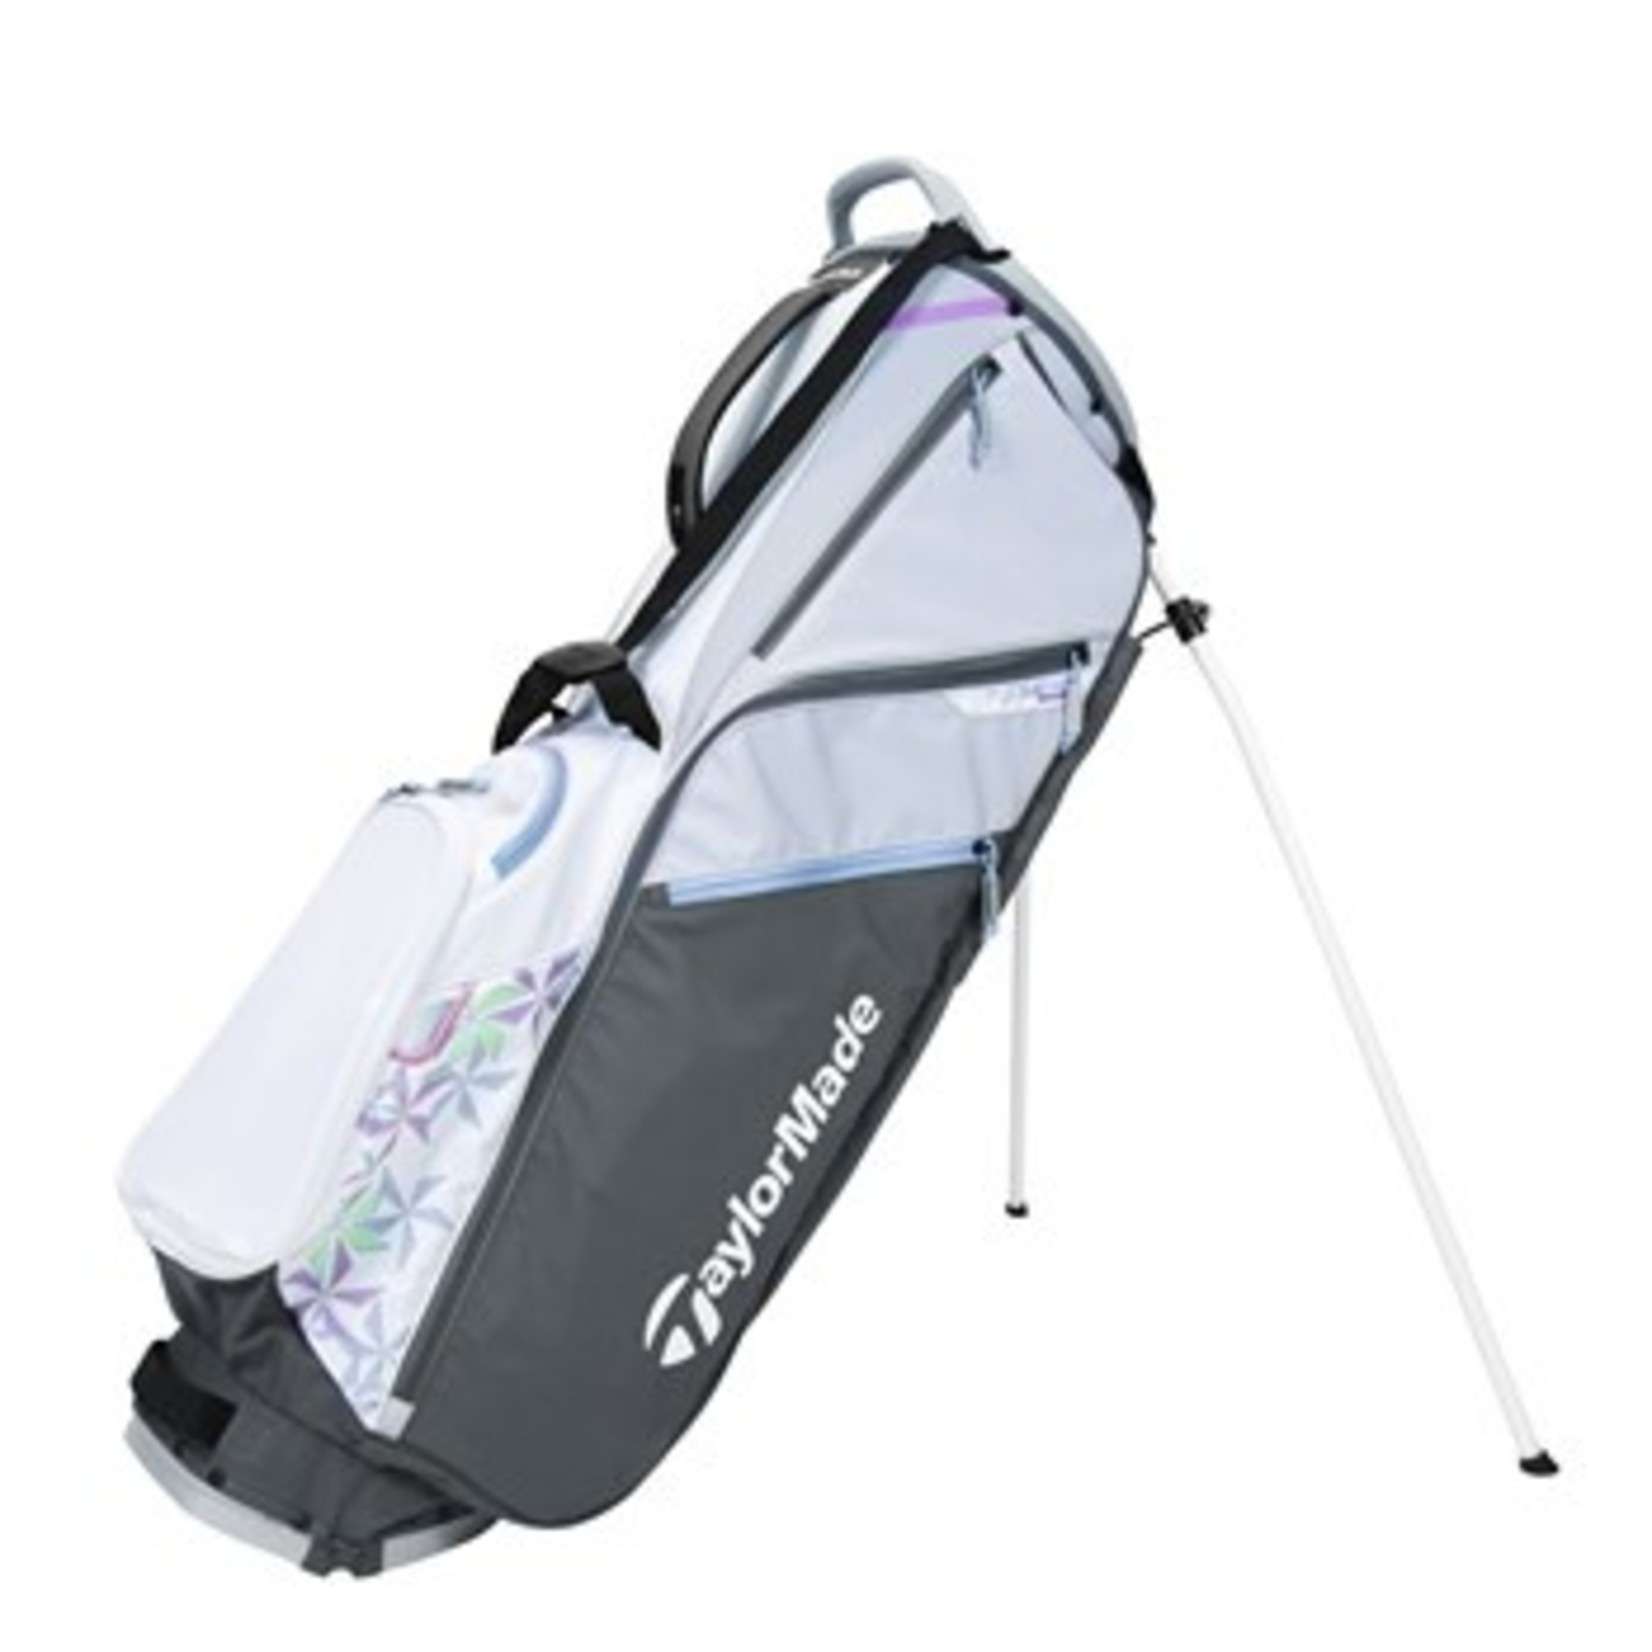 TaylorMade TM21 Ladies Kalea FlexTech Lite Stand Bag